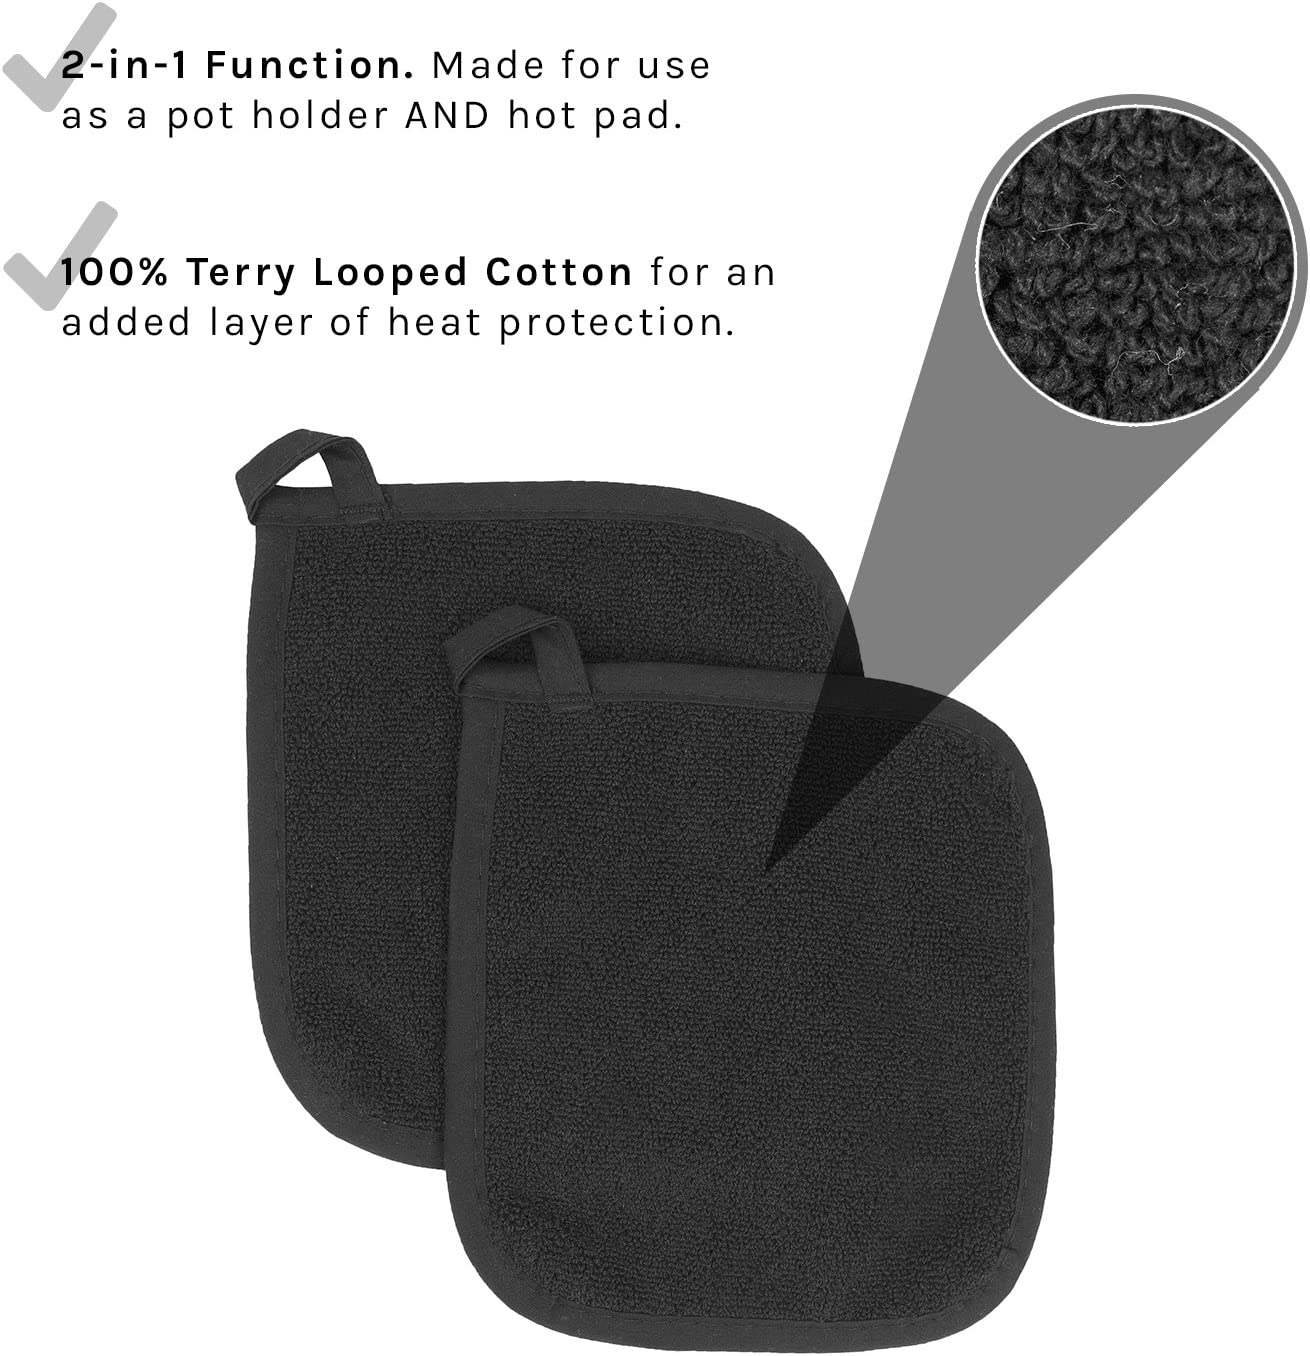 Ritz Royale Collection 100% Cotton Terry Cloth Pot Holder Set, Kitchen Hot Pad, 2-Pack, Black: Home & Kitchen